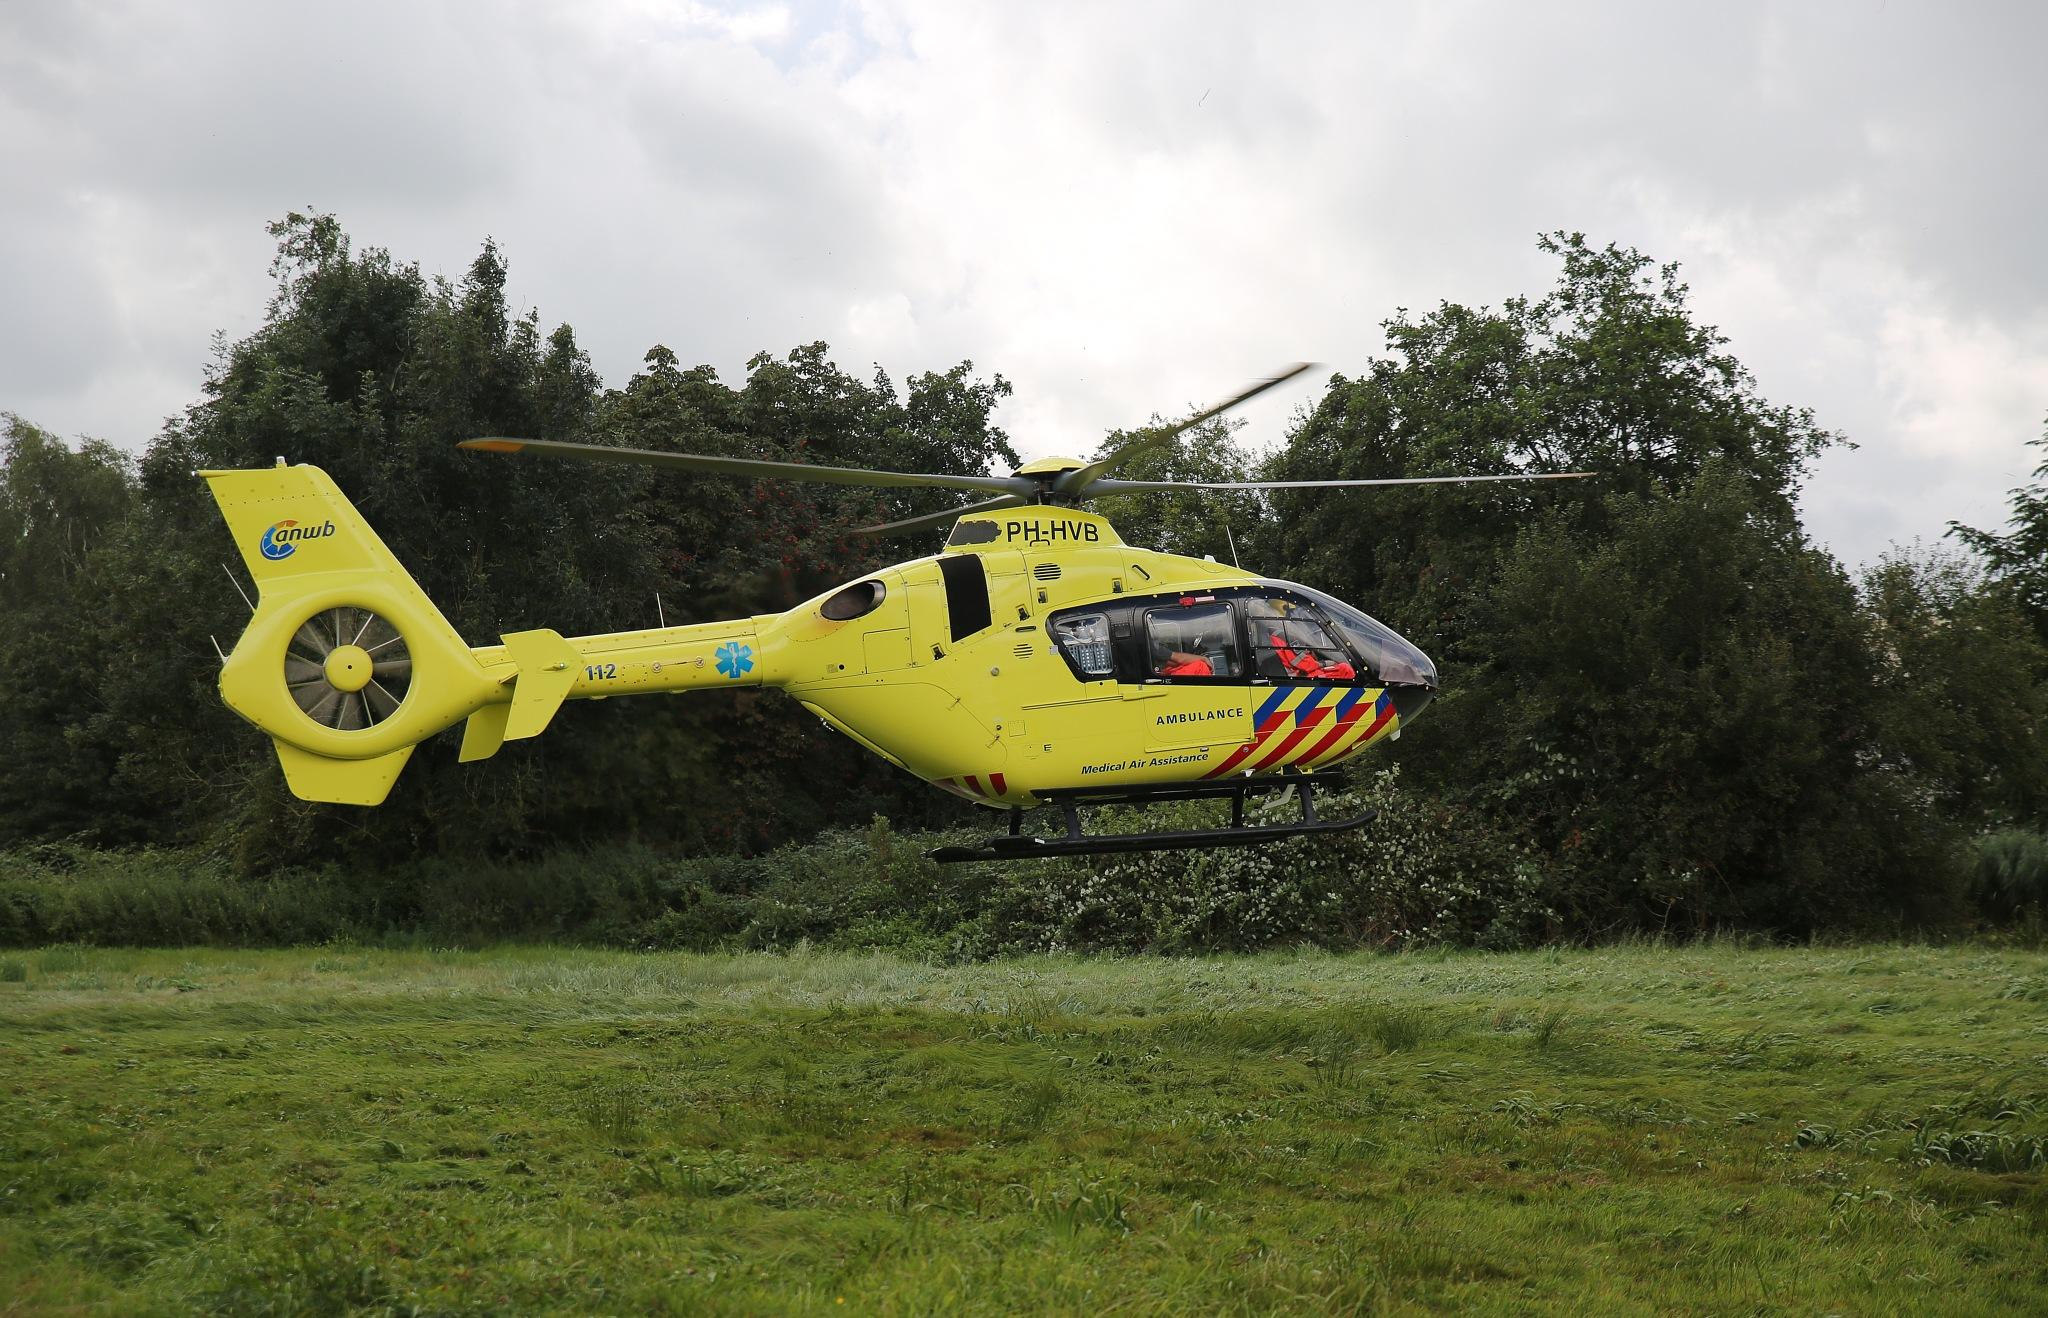 trauma chopter by Felix Jean Touboul